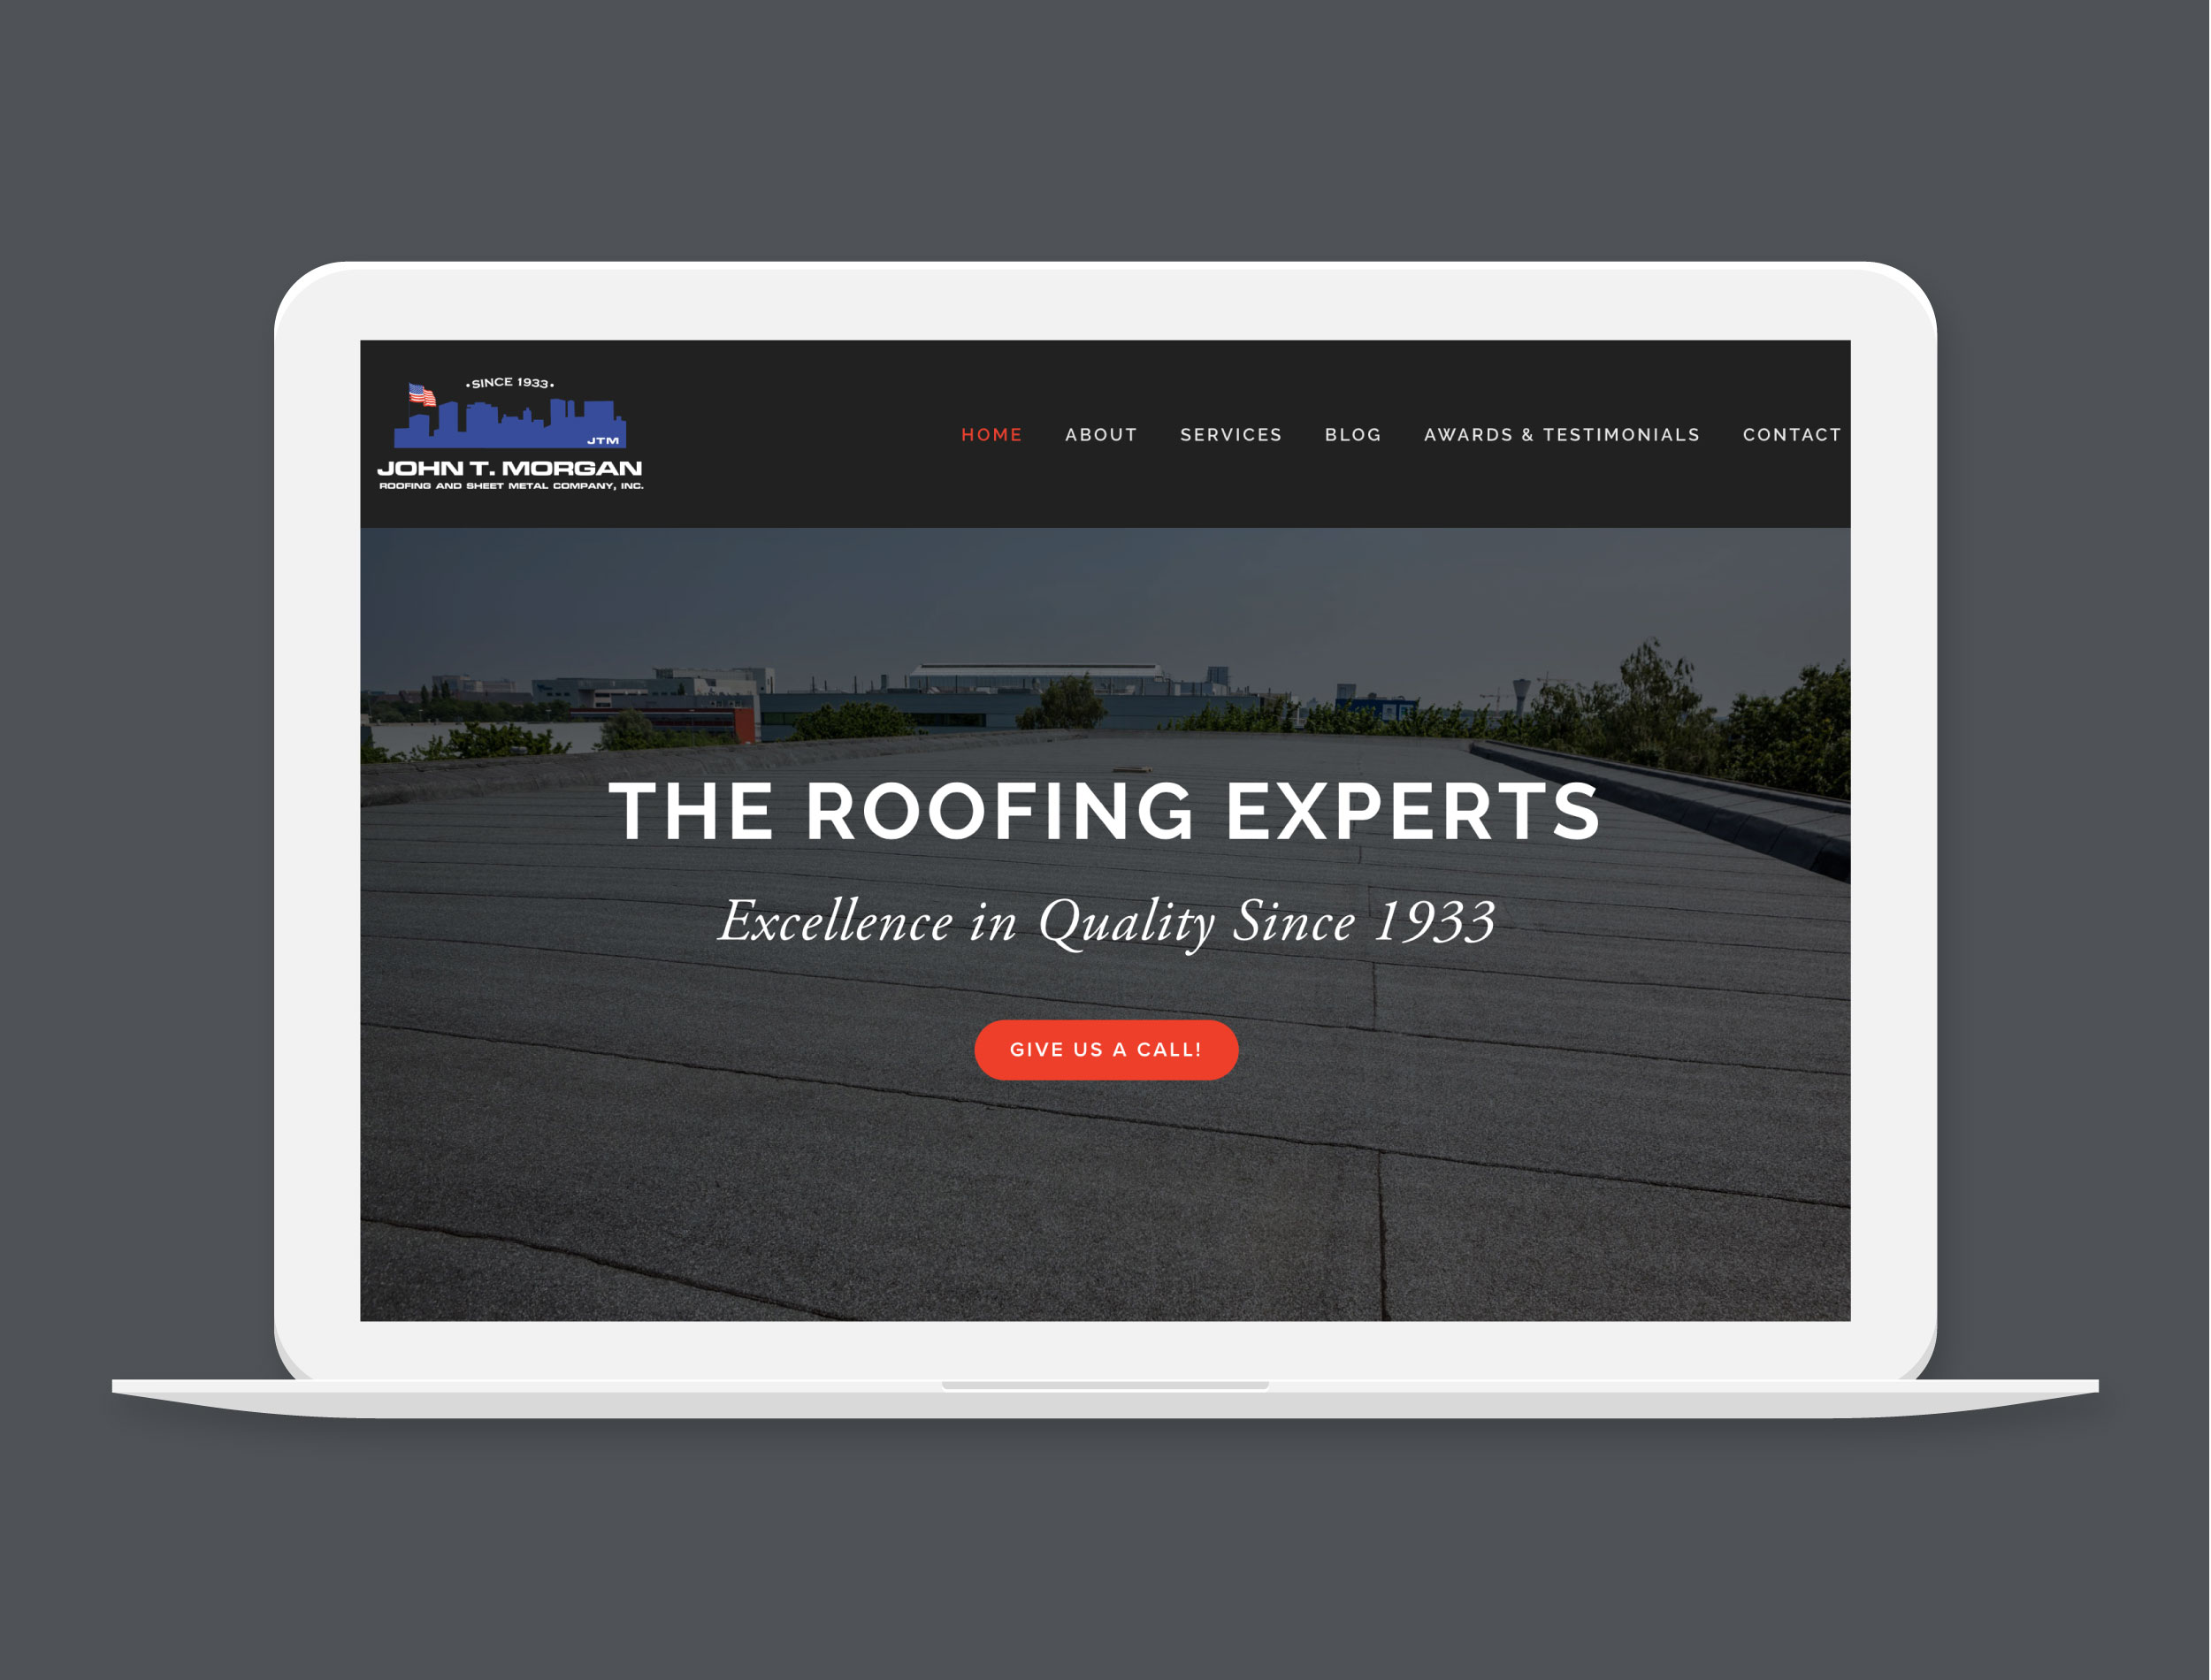 John T Morgan Roofing   Roofing Company in Roanoke, Virginia   Project Details   Visit Website